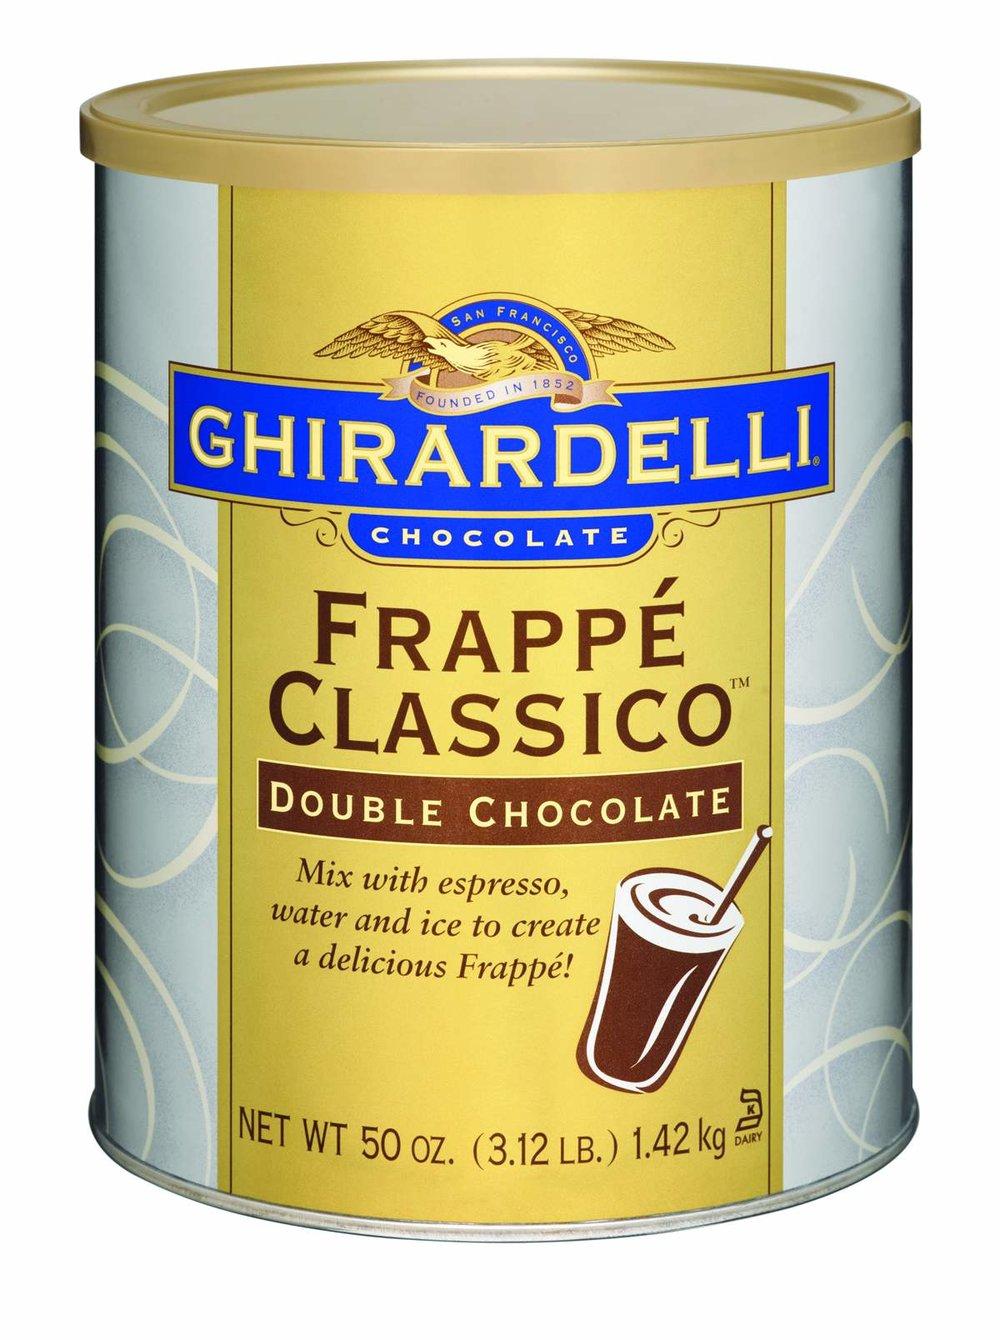 Frappé Classico Double Chocolate